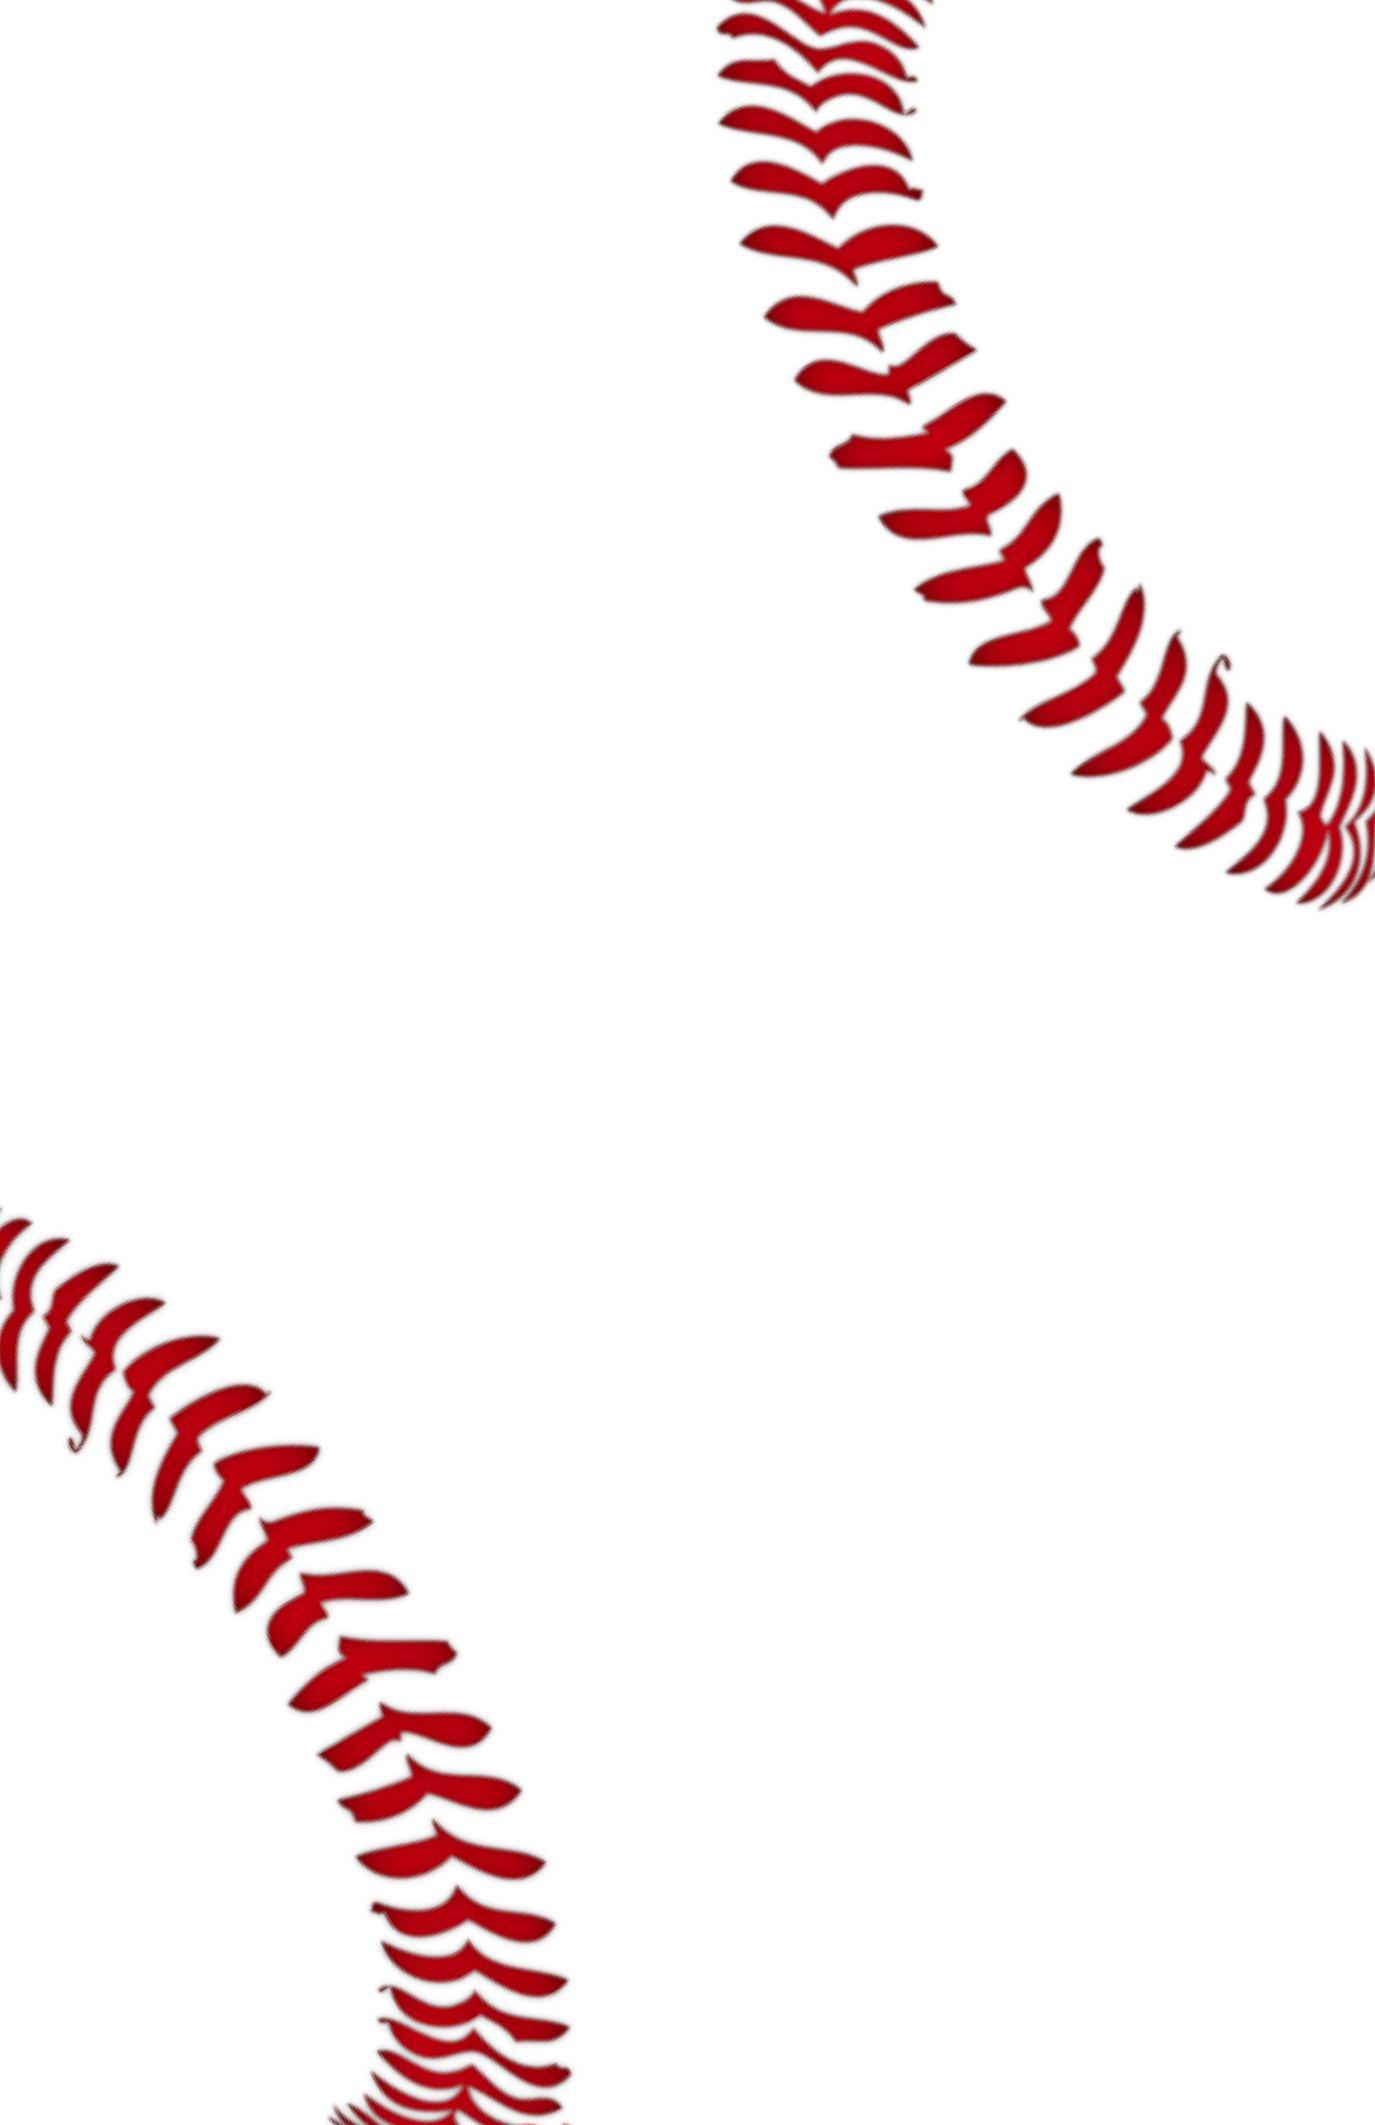 Baseball Party Invitations Free Printable | Cj | Baseball Party - Free Printable Baseball Stationery